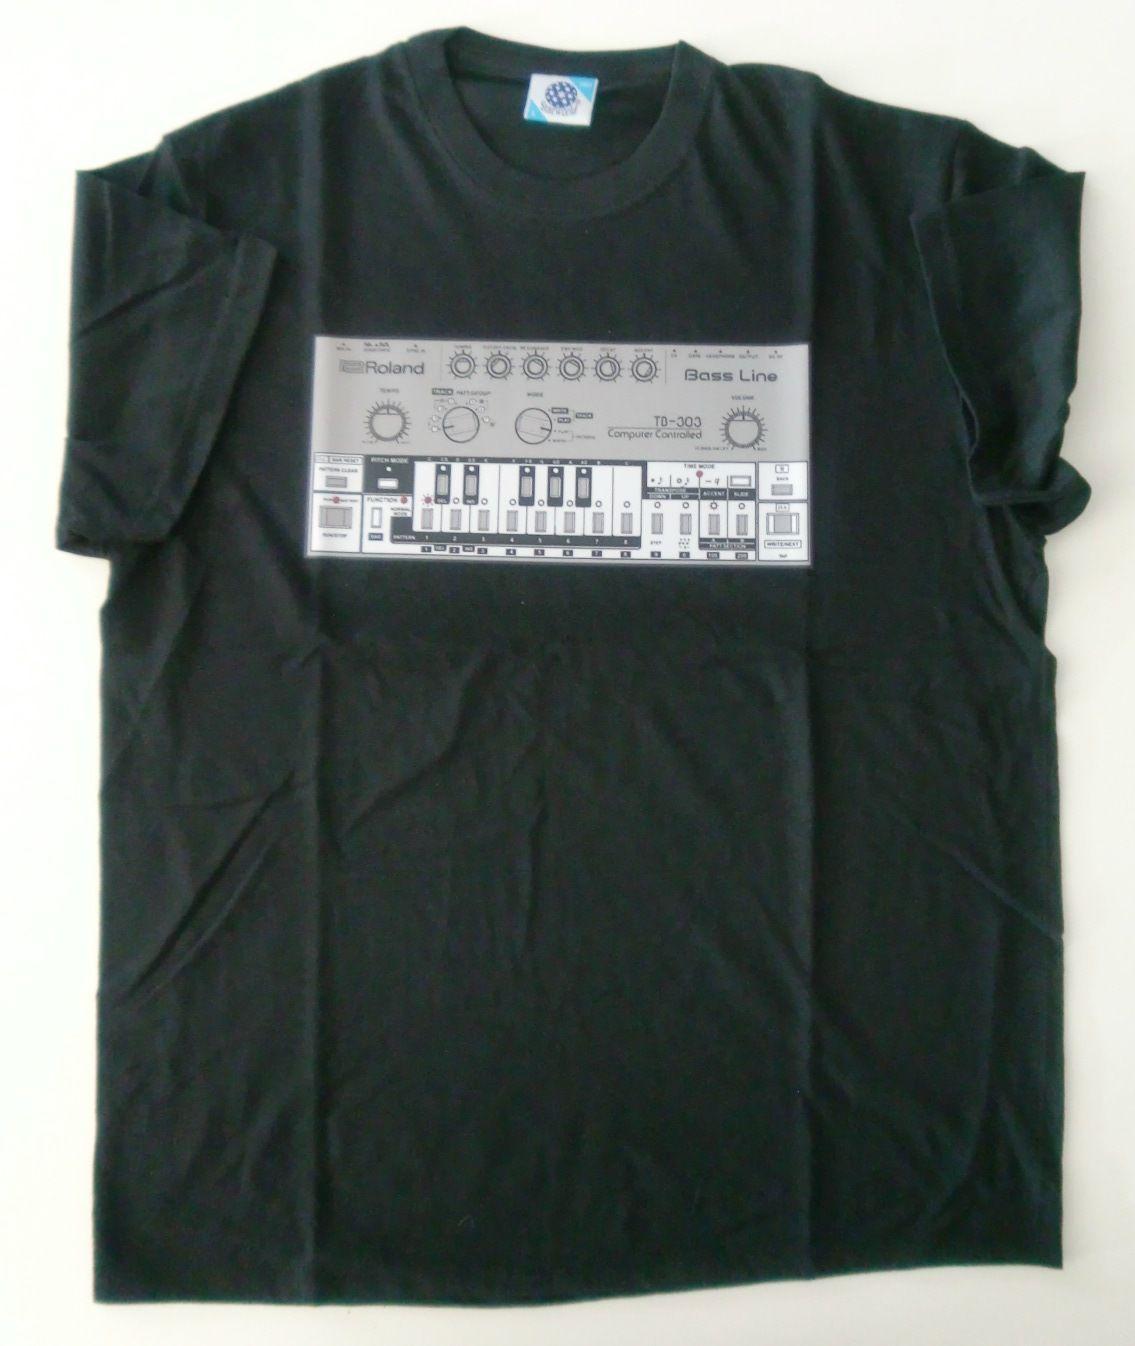 Roland TB 303 Bass Line T Shirt (Black / Size M) NEW